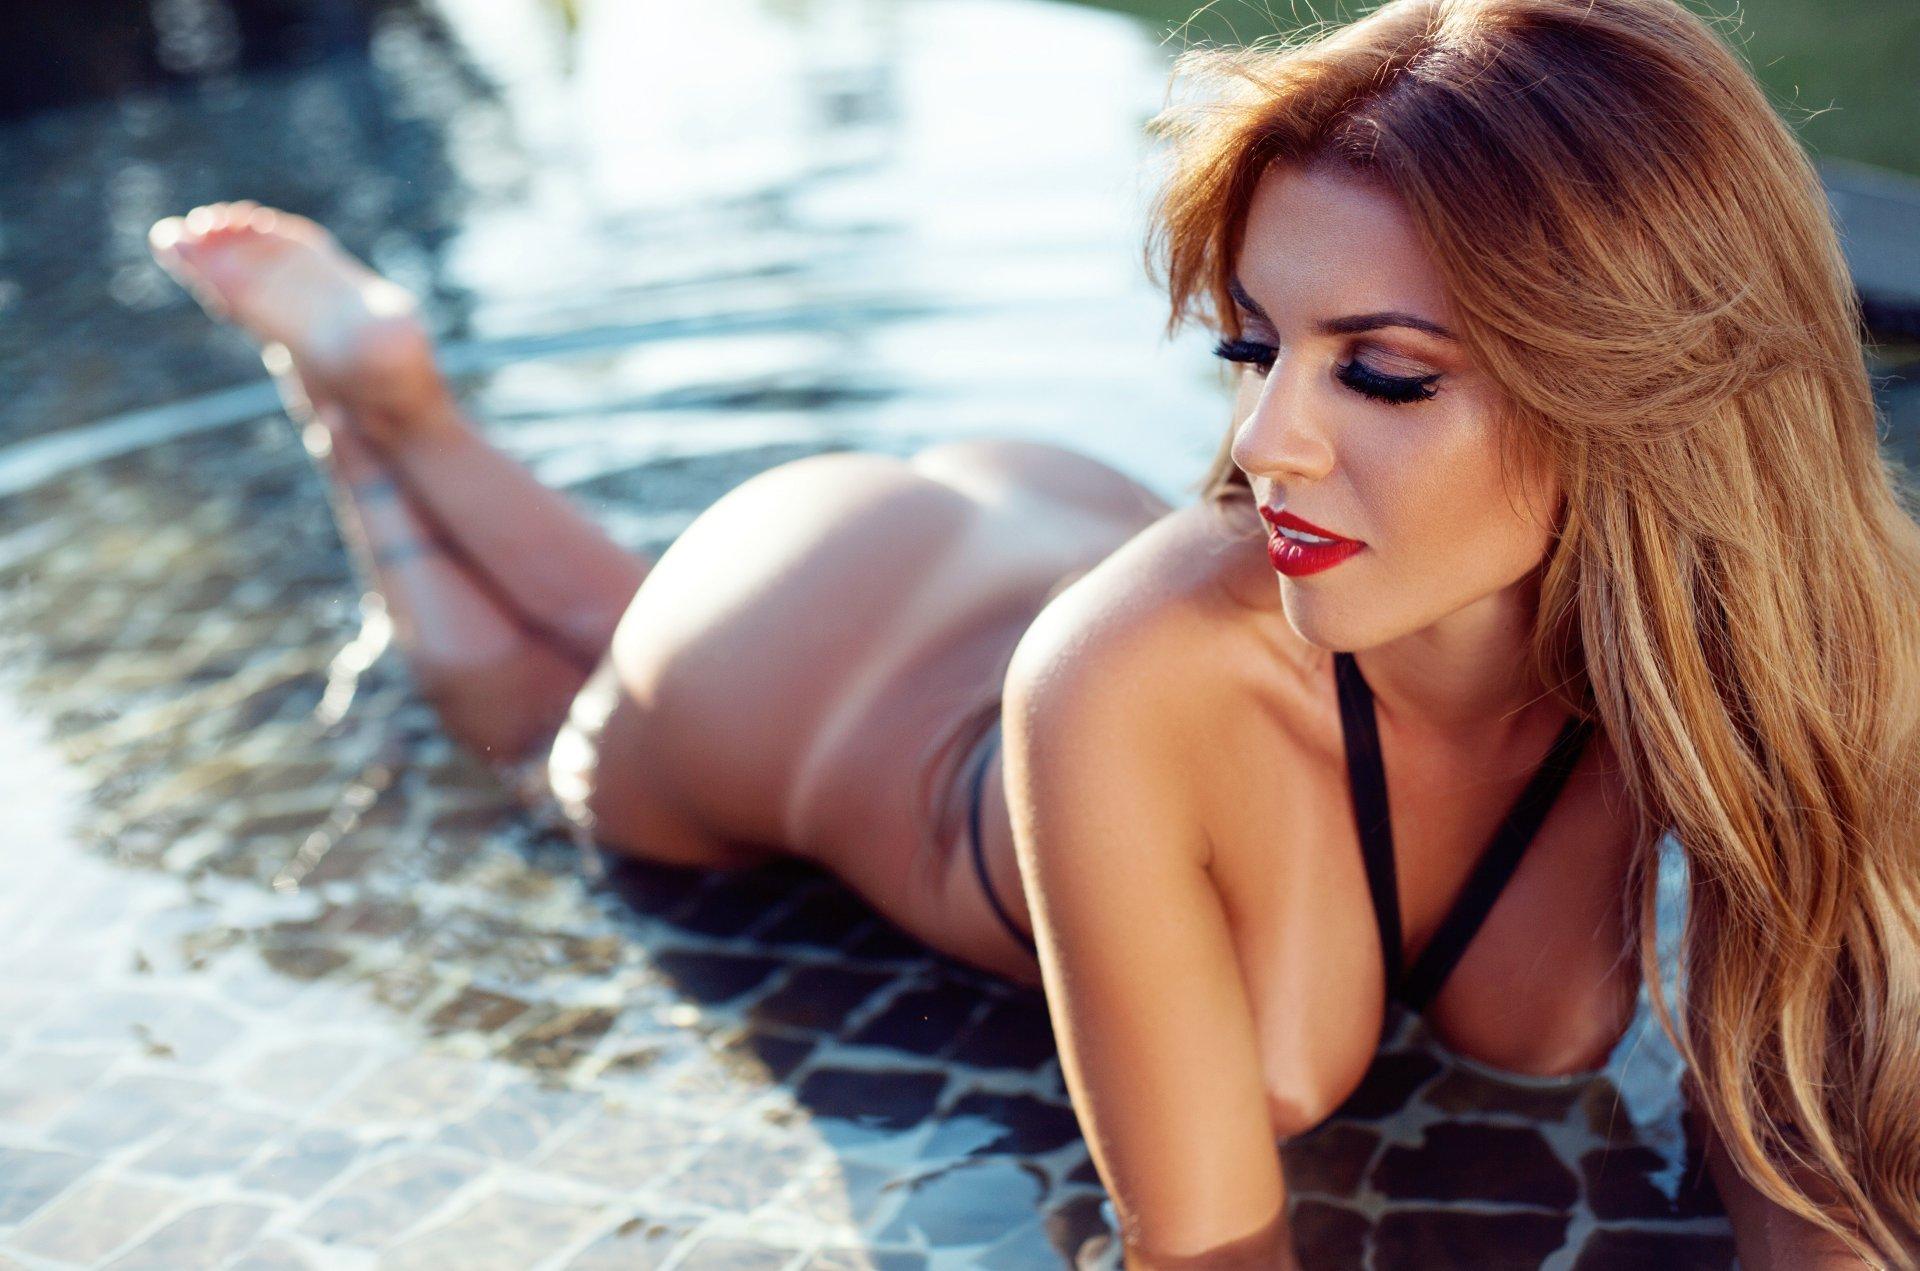 Sara pavan tits,Aida yespica gets caught looking hot Sex clip Daisy Eagan,REDDIT Bahar Kizil